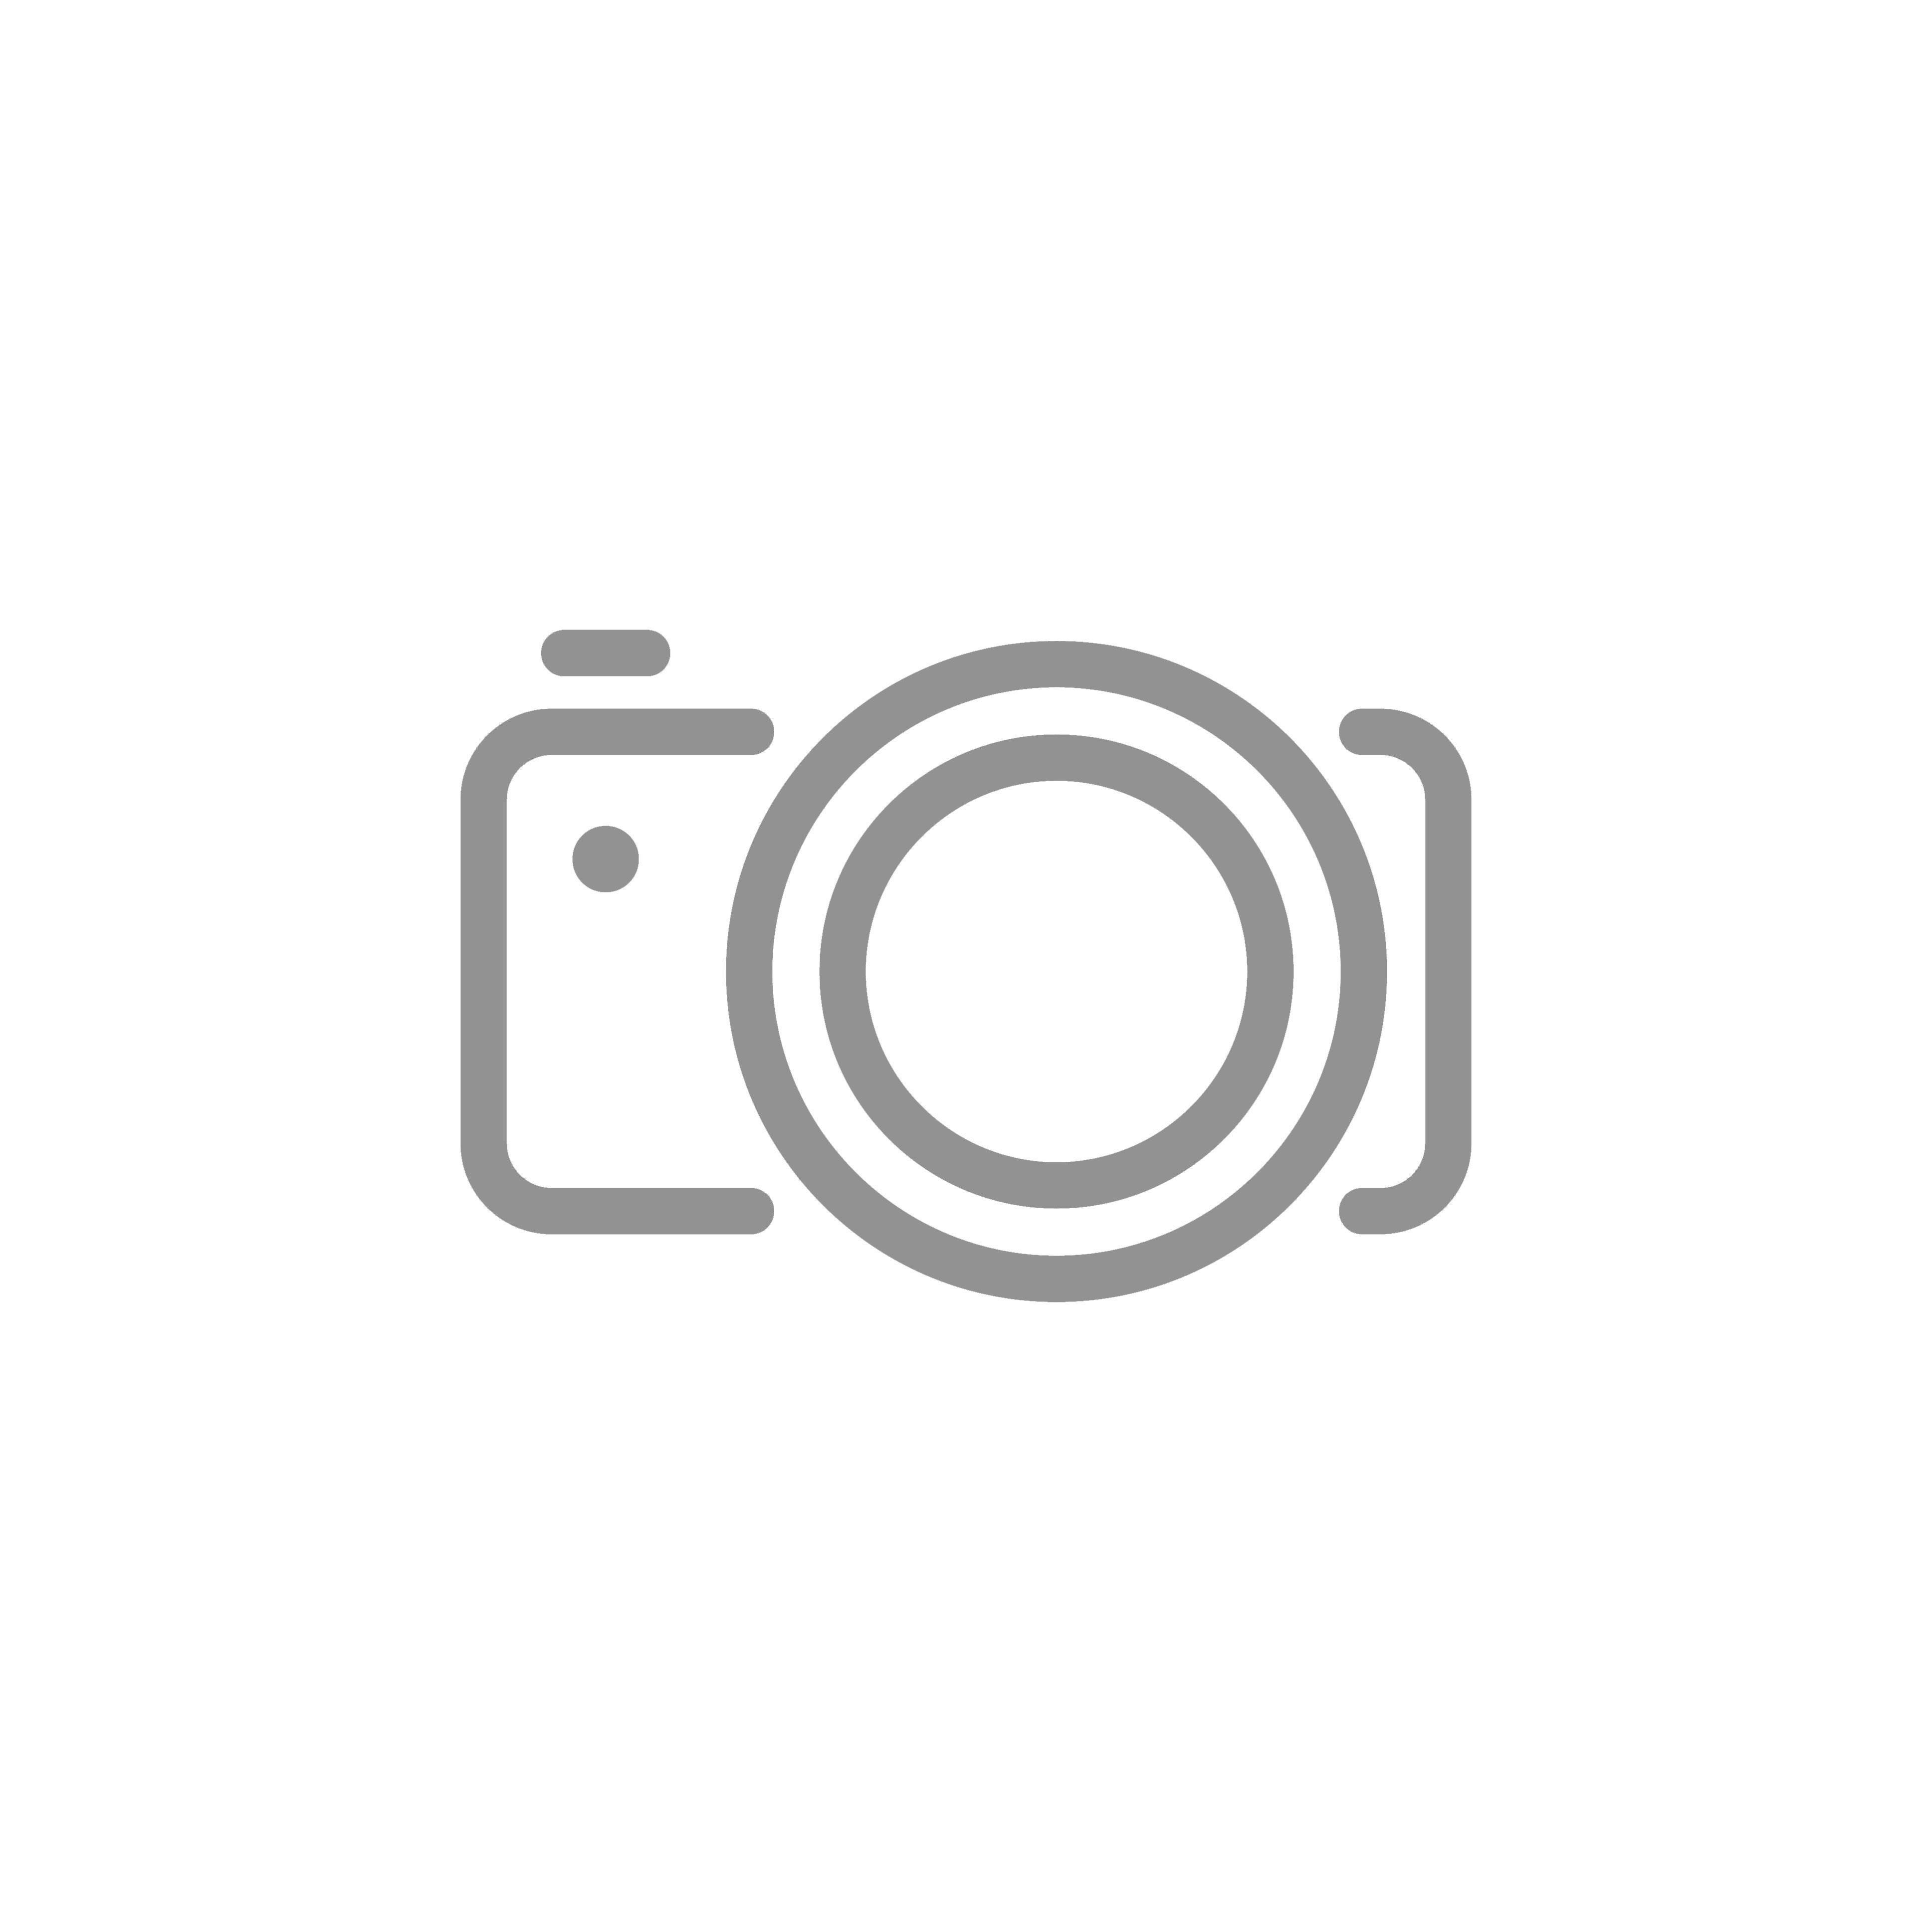 Tough-JAK Samsung Galaxy S21 FE Carbon Fiber Case & Screen Protector - Black MS000918